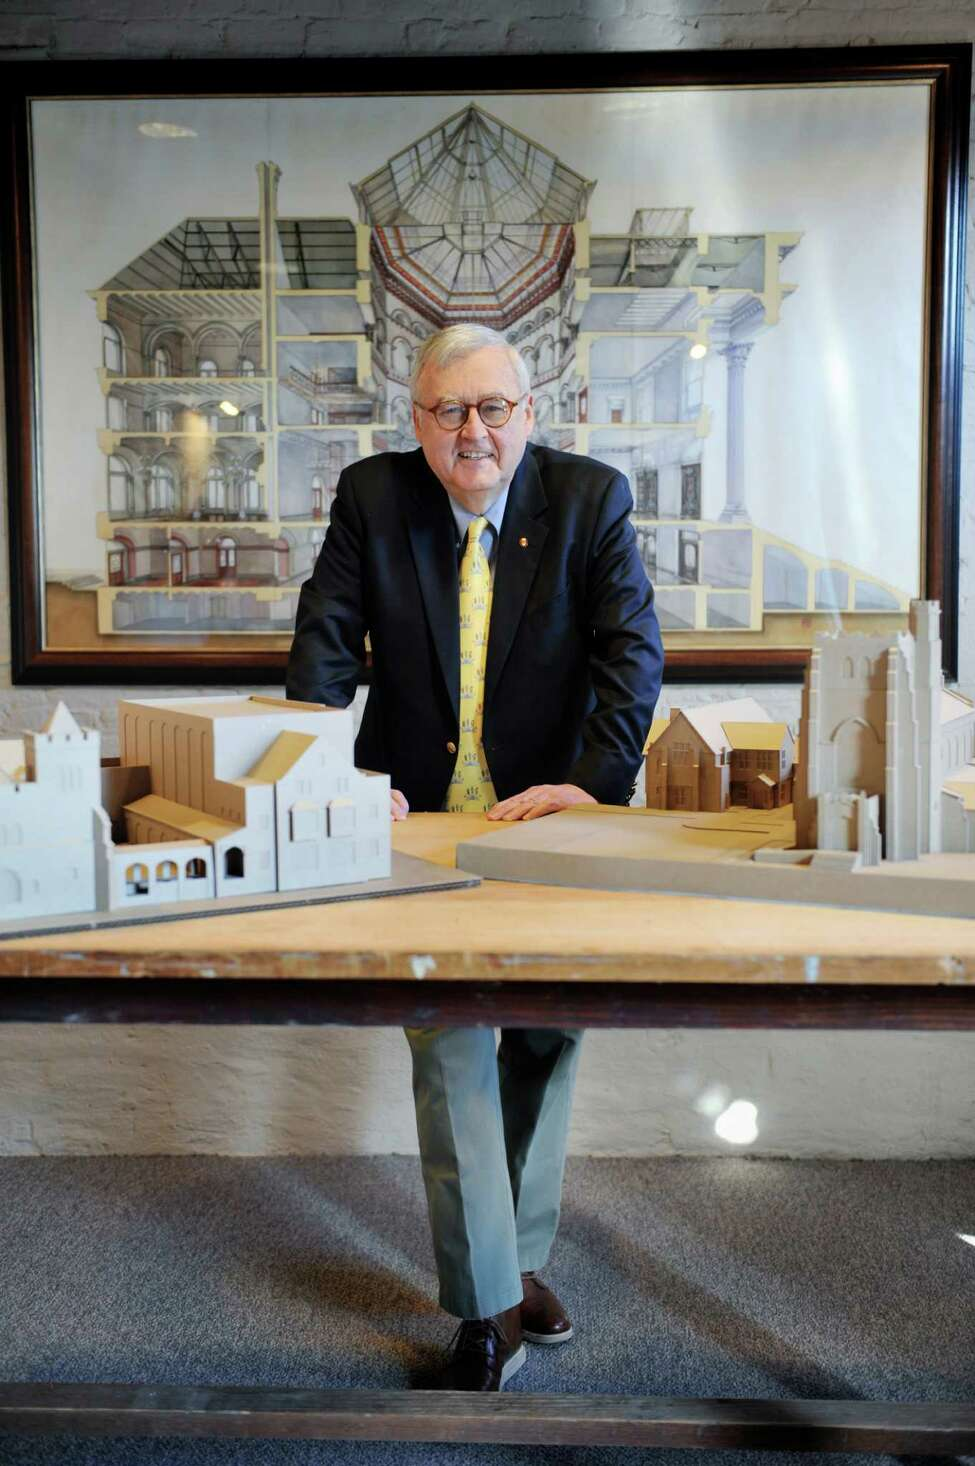 John G. Waite . AGE: 72. BUSINESS: John G. Waite Associates, Architects, PLLC. TITLE: Senior principal. LOCATION: Albany. JOB DESCRIPTION: Professional architect who specializes in historic preservation.